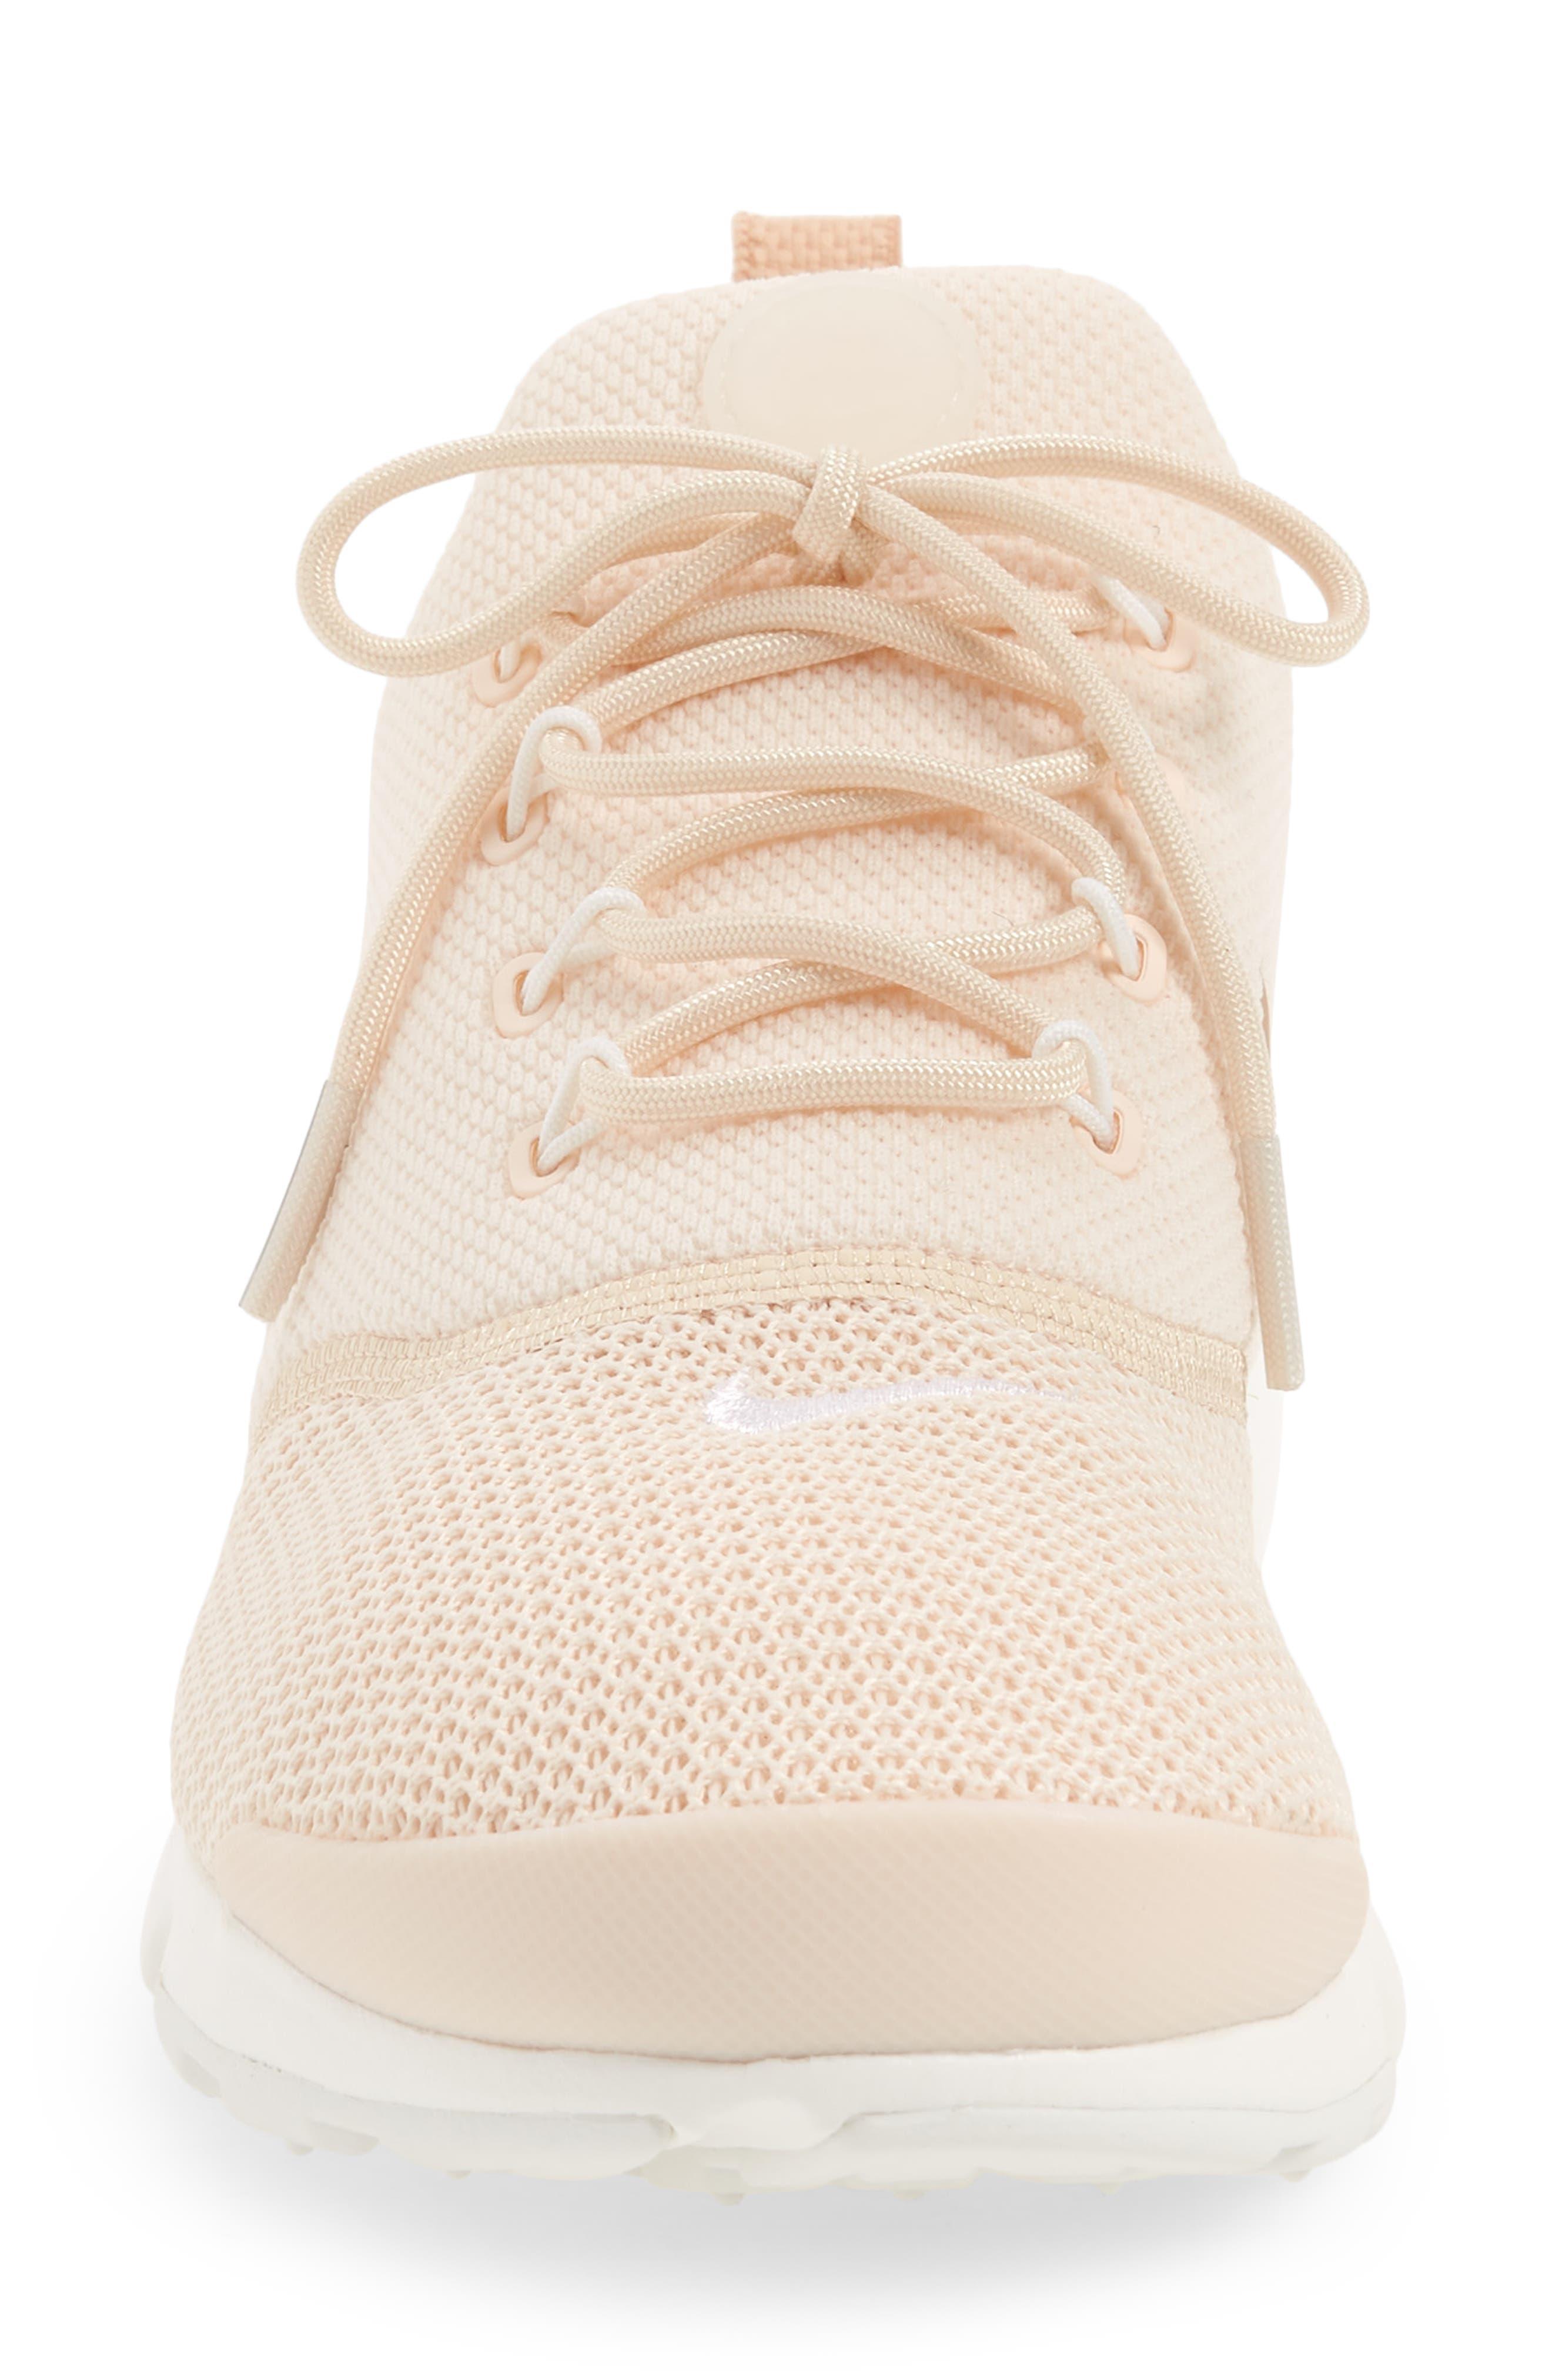 Presto Fly Sneaker,                             Alternate thumbnail 5, color,                             Guava Ice/ Beige/ Summit White